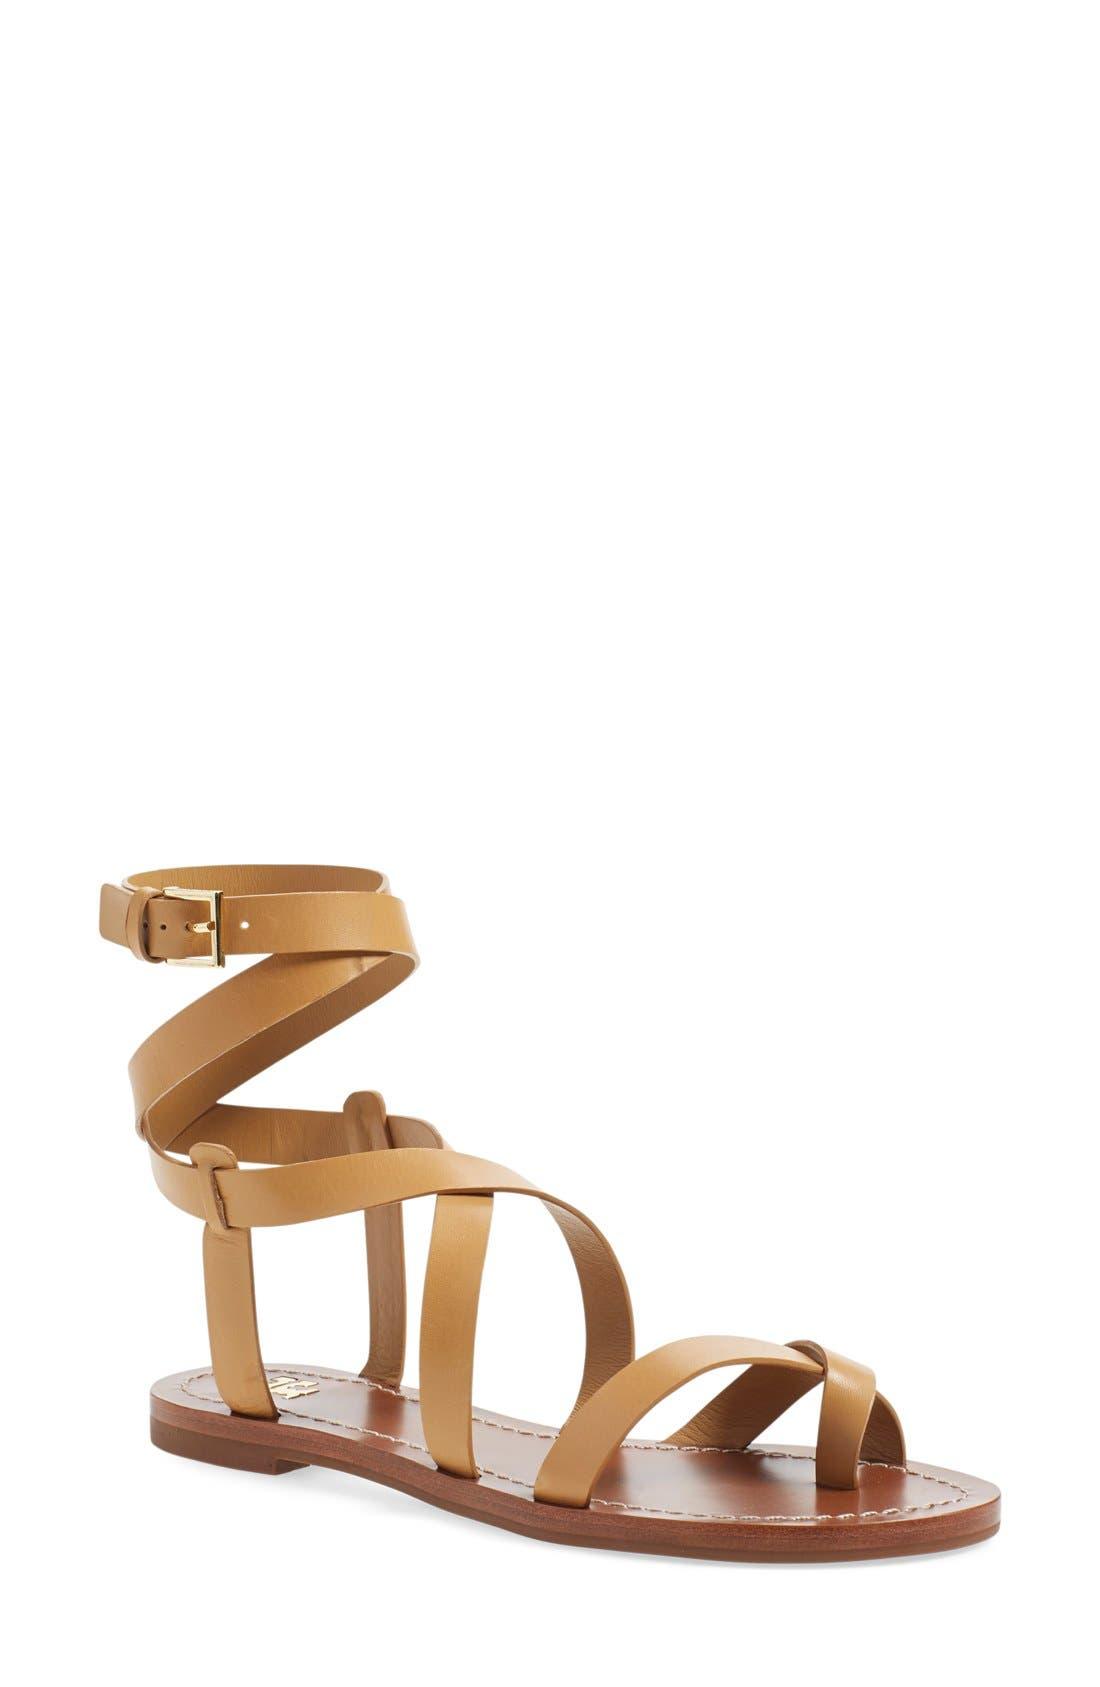 'Patos' Gladiator Sandal,                         Main,                         color, Blond Manark Vachetta